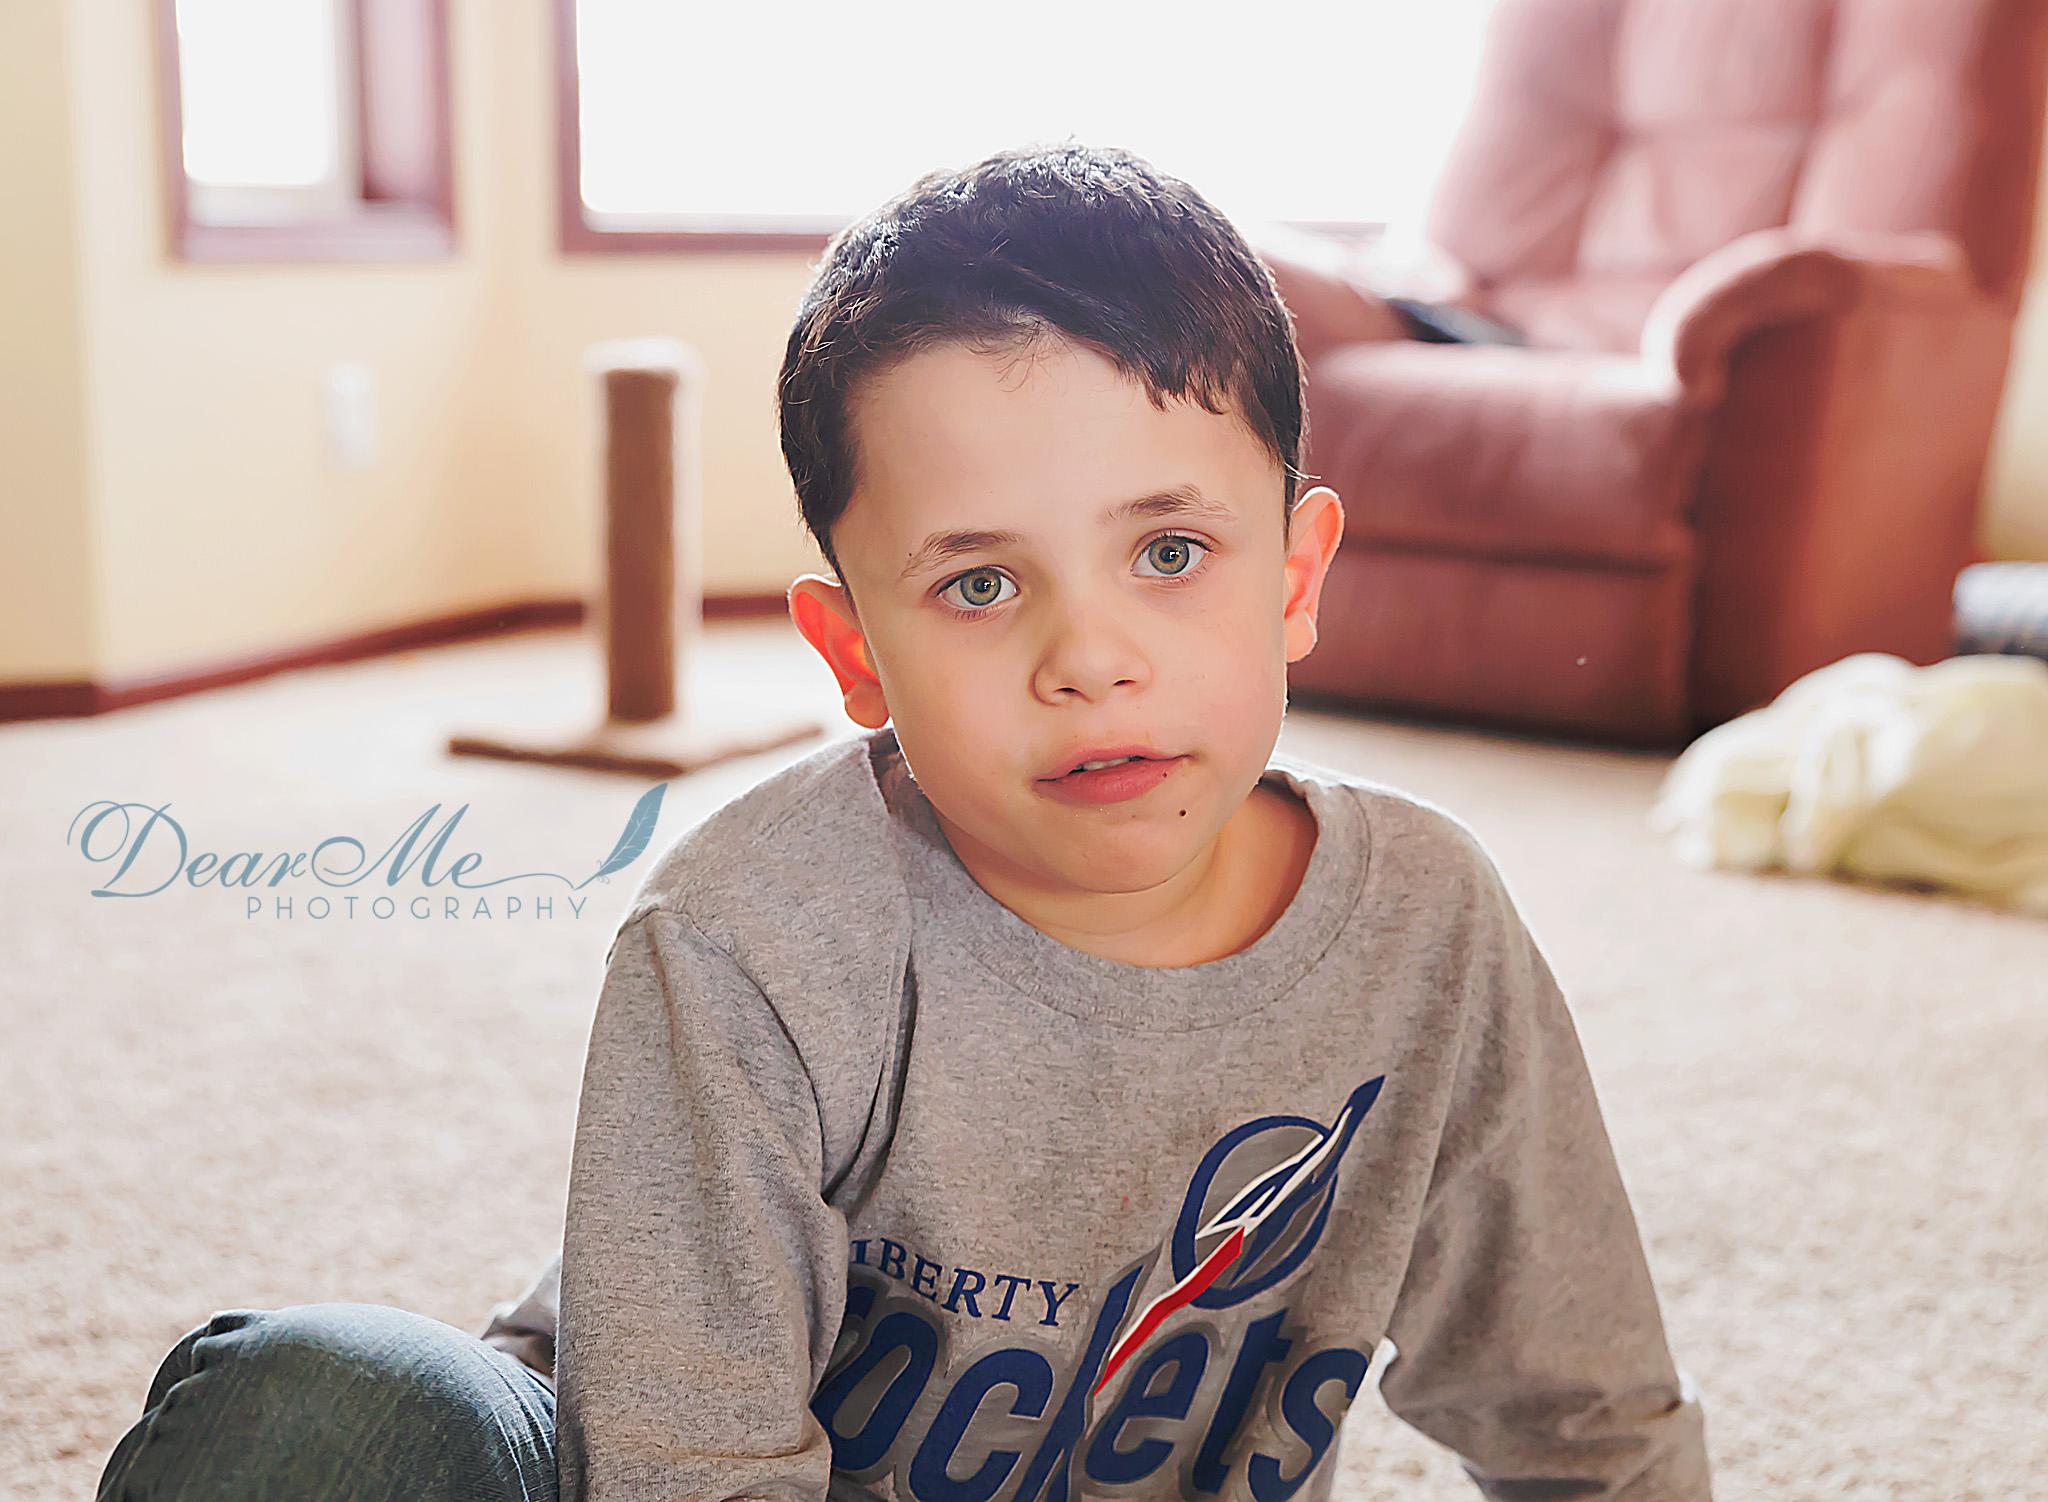 dear me photography bismarck photographer boy in grey shirt sitting on living room floor